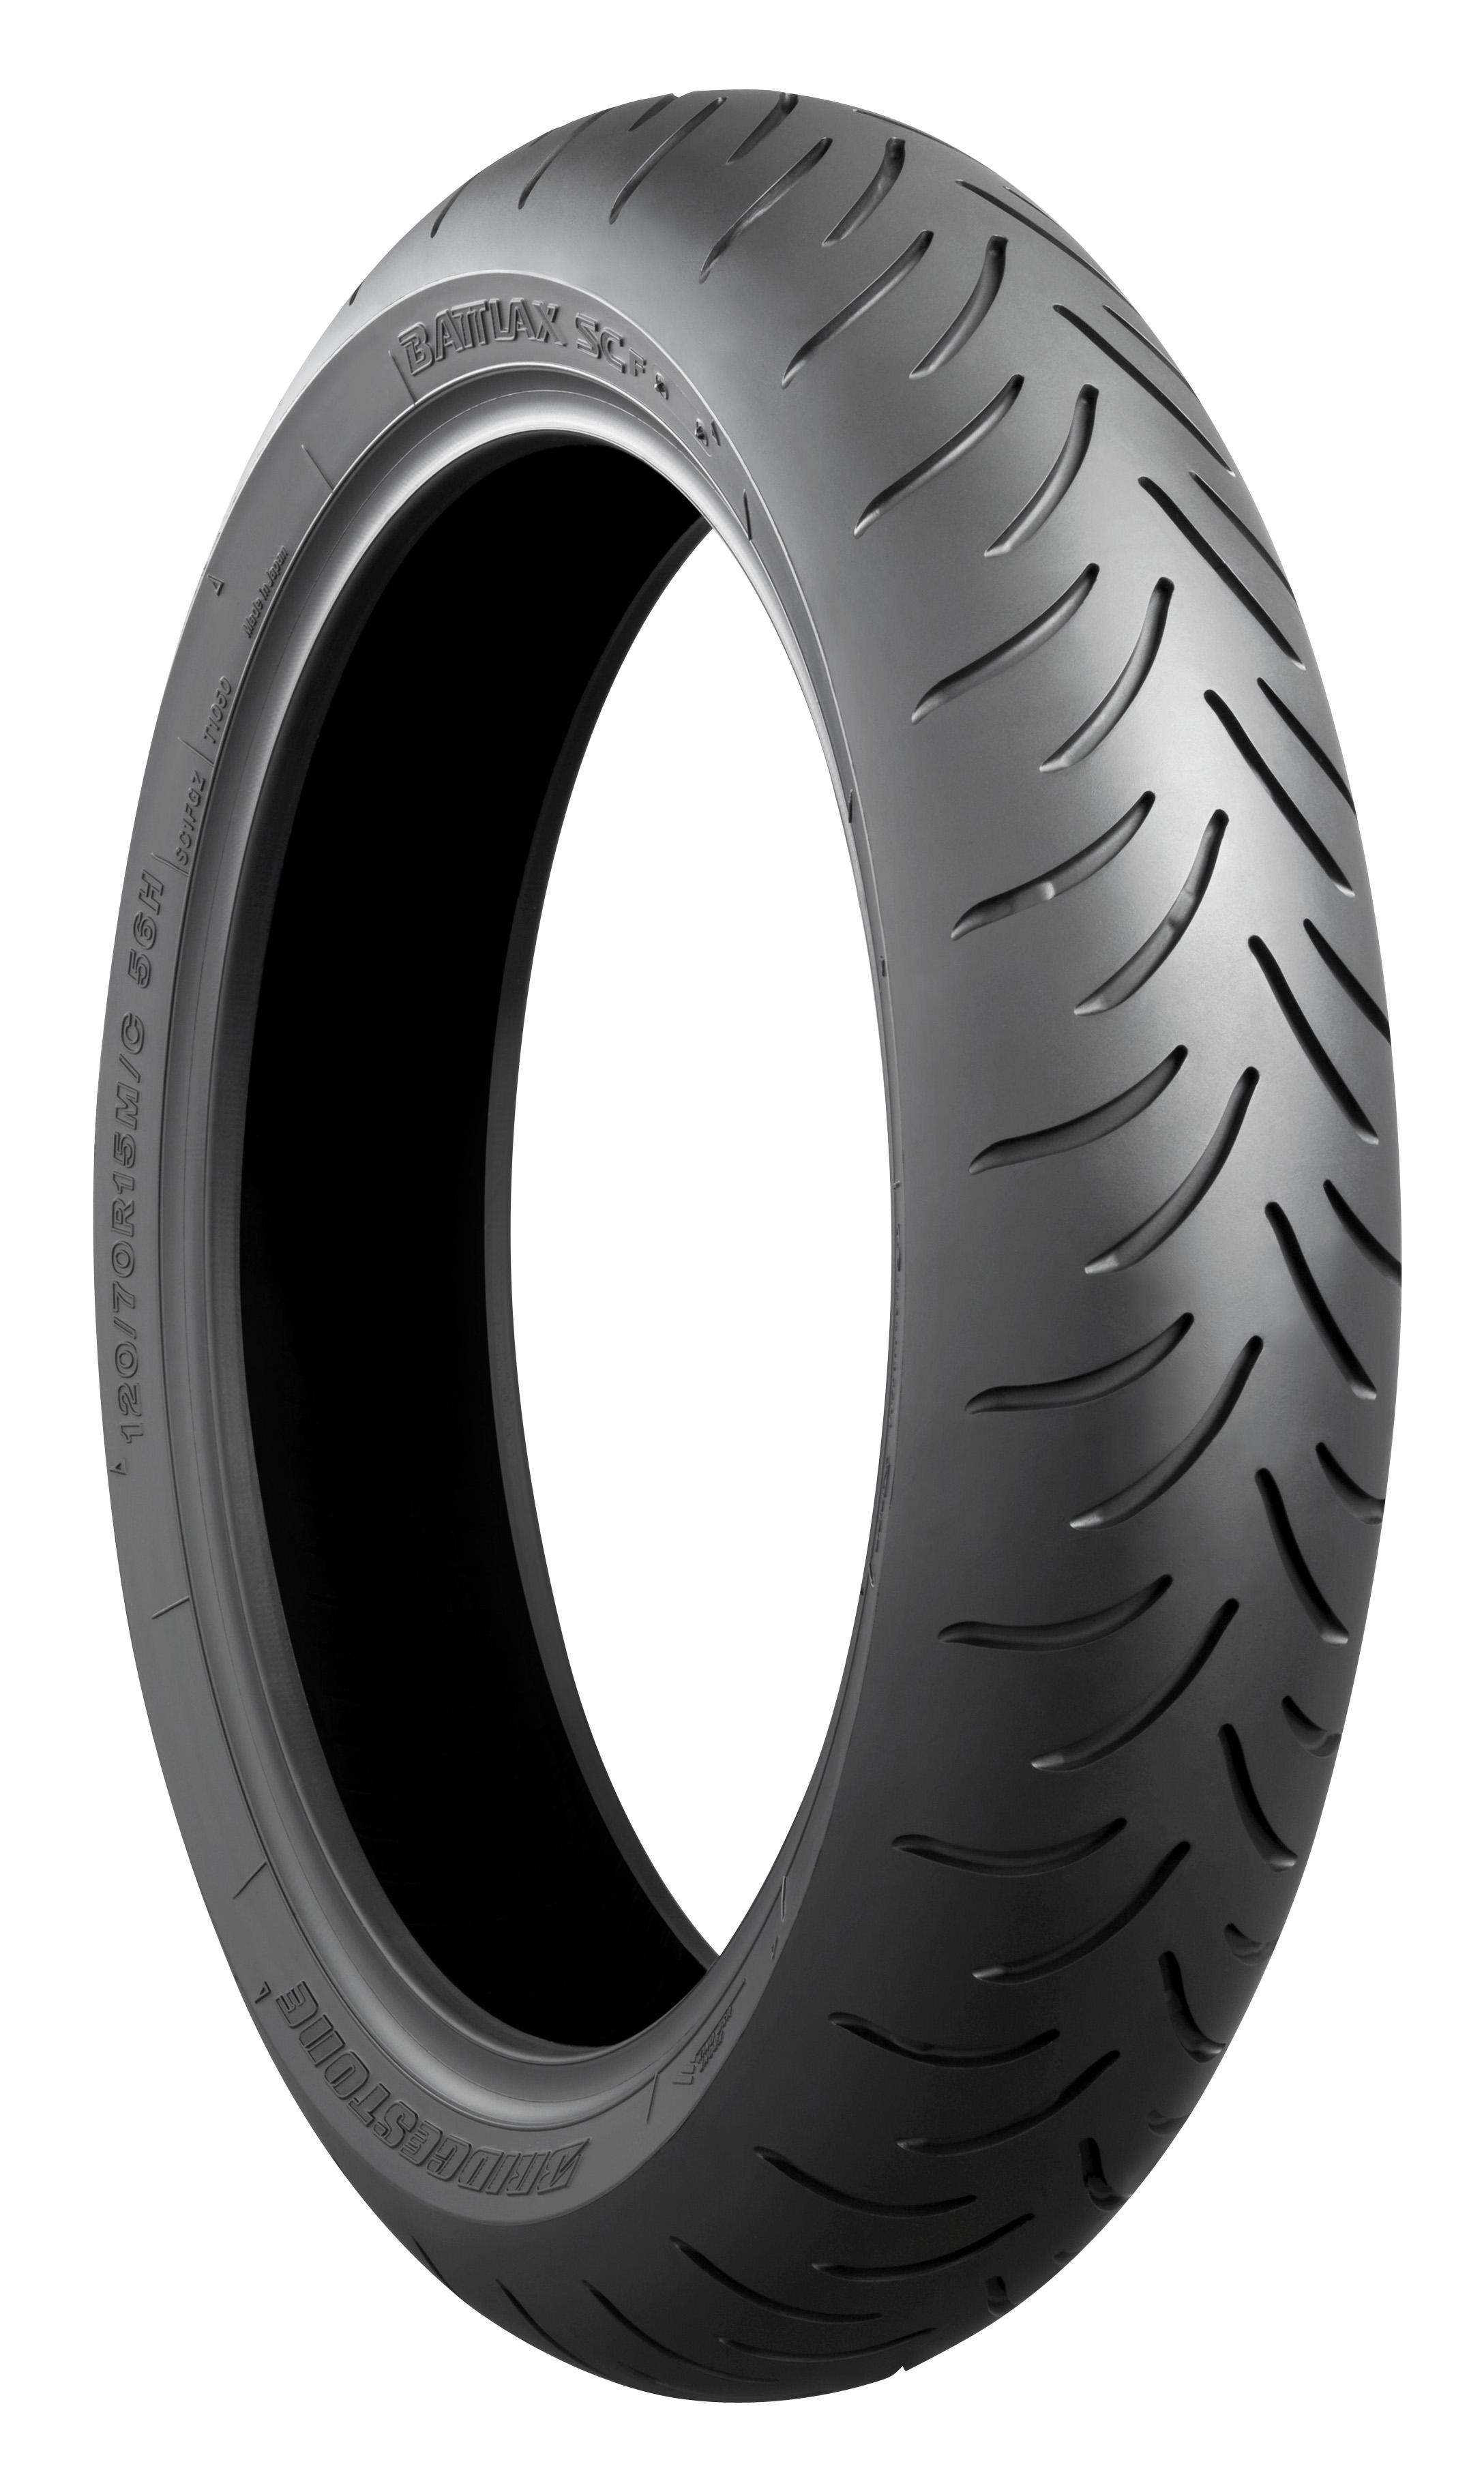 Bridgestone Battlax Scooter SC 120/70S12 (51S) Bias Front Tyre